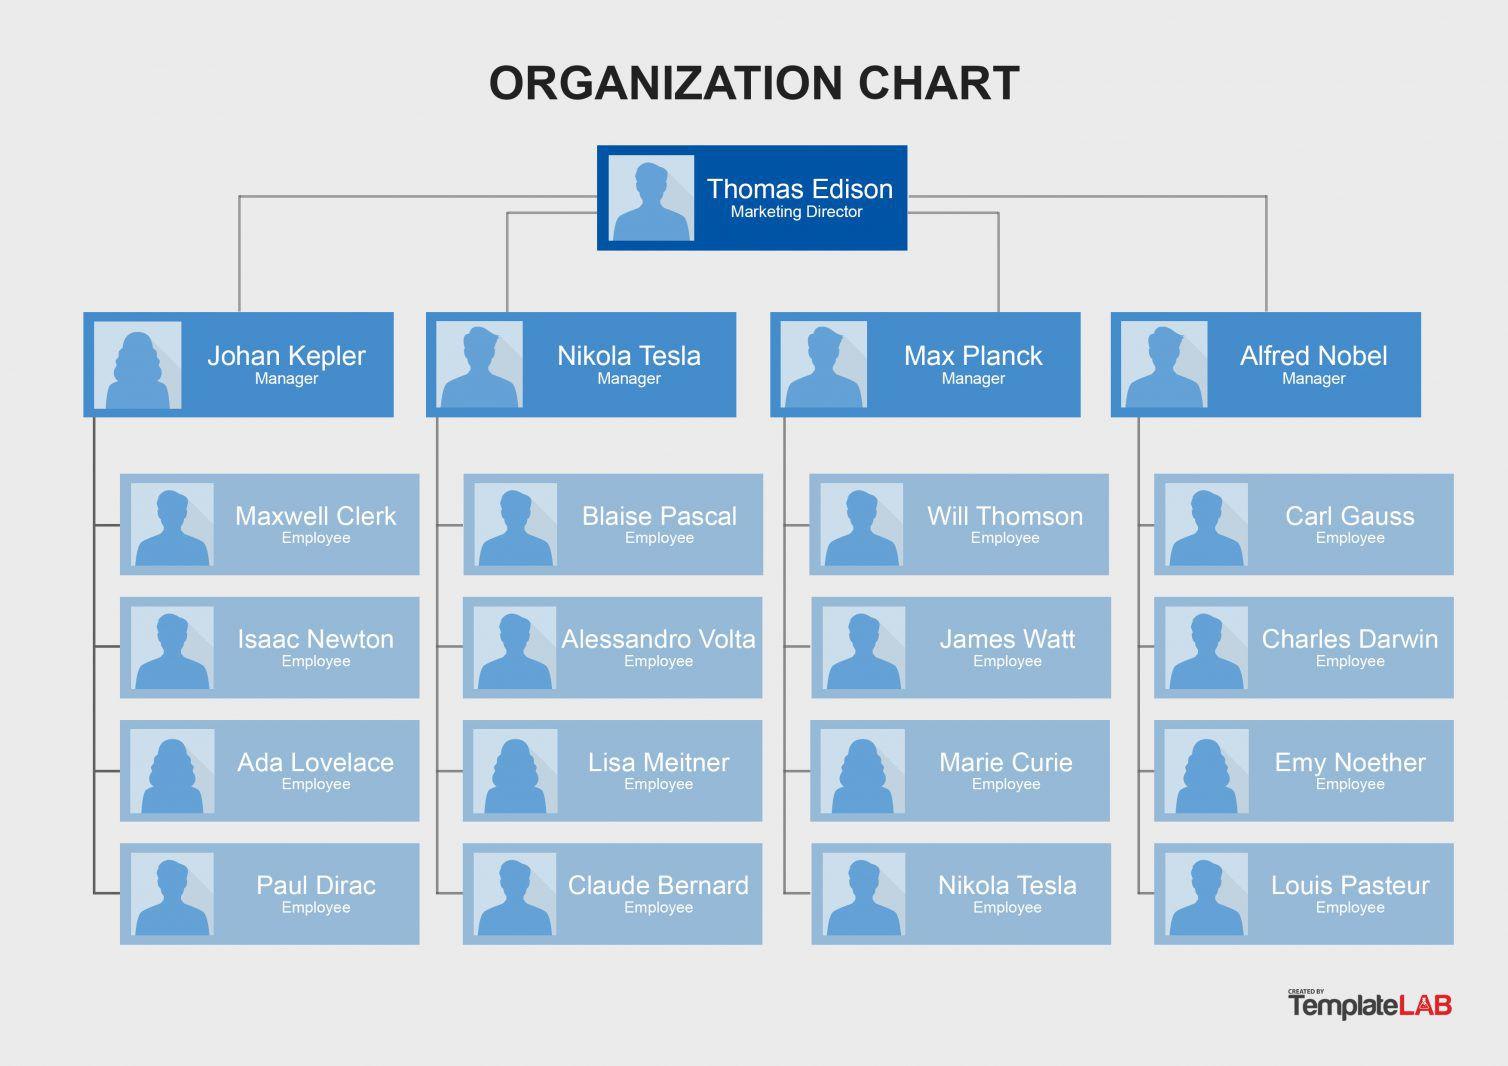 008 Awful Microsoft Word Organization Chart Template Example  Organizational Download 2007Full